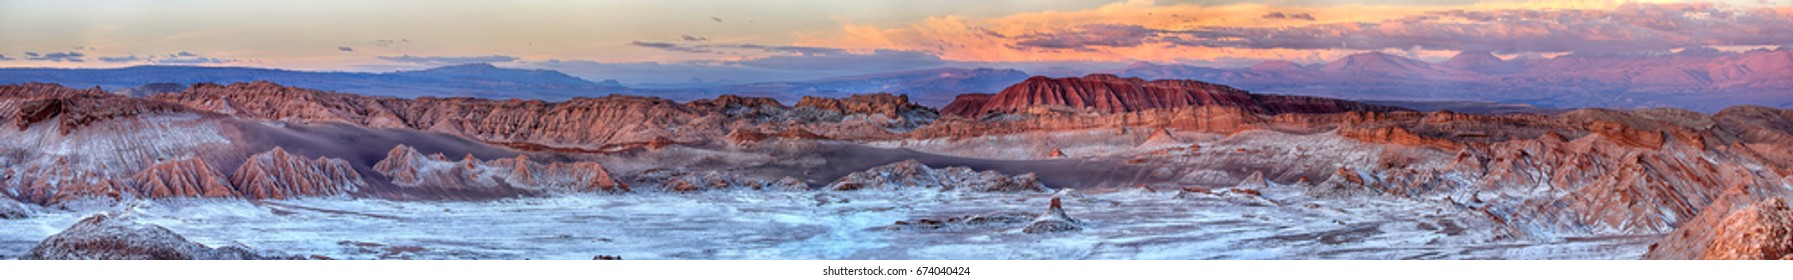 Sunset at Valle de Luna - Atacama desert near San Pedro (chile)